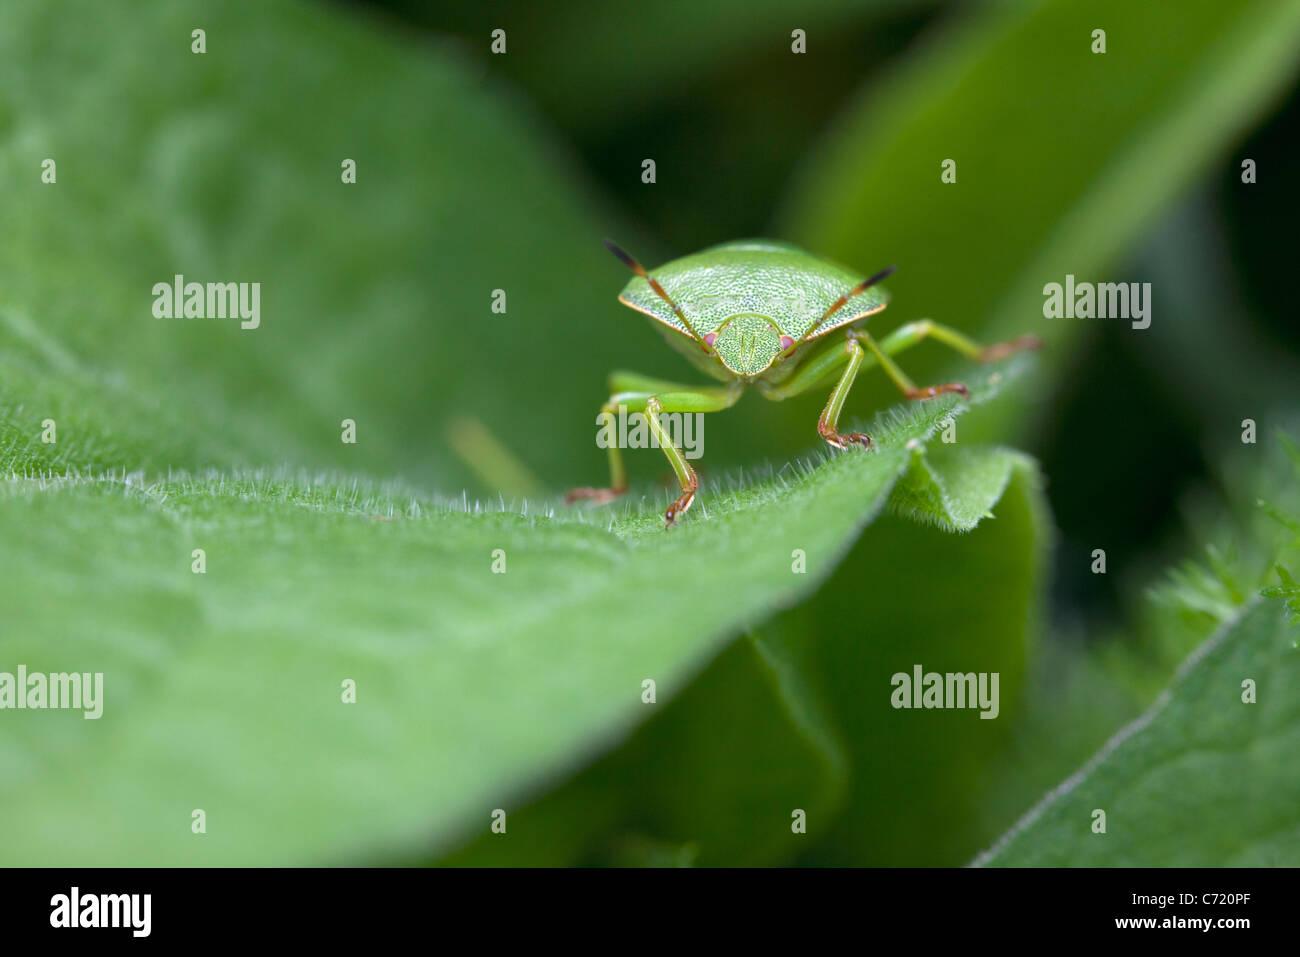 Green stink bug on leaf, close-up - Stock Image